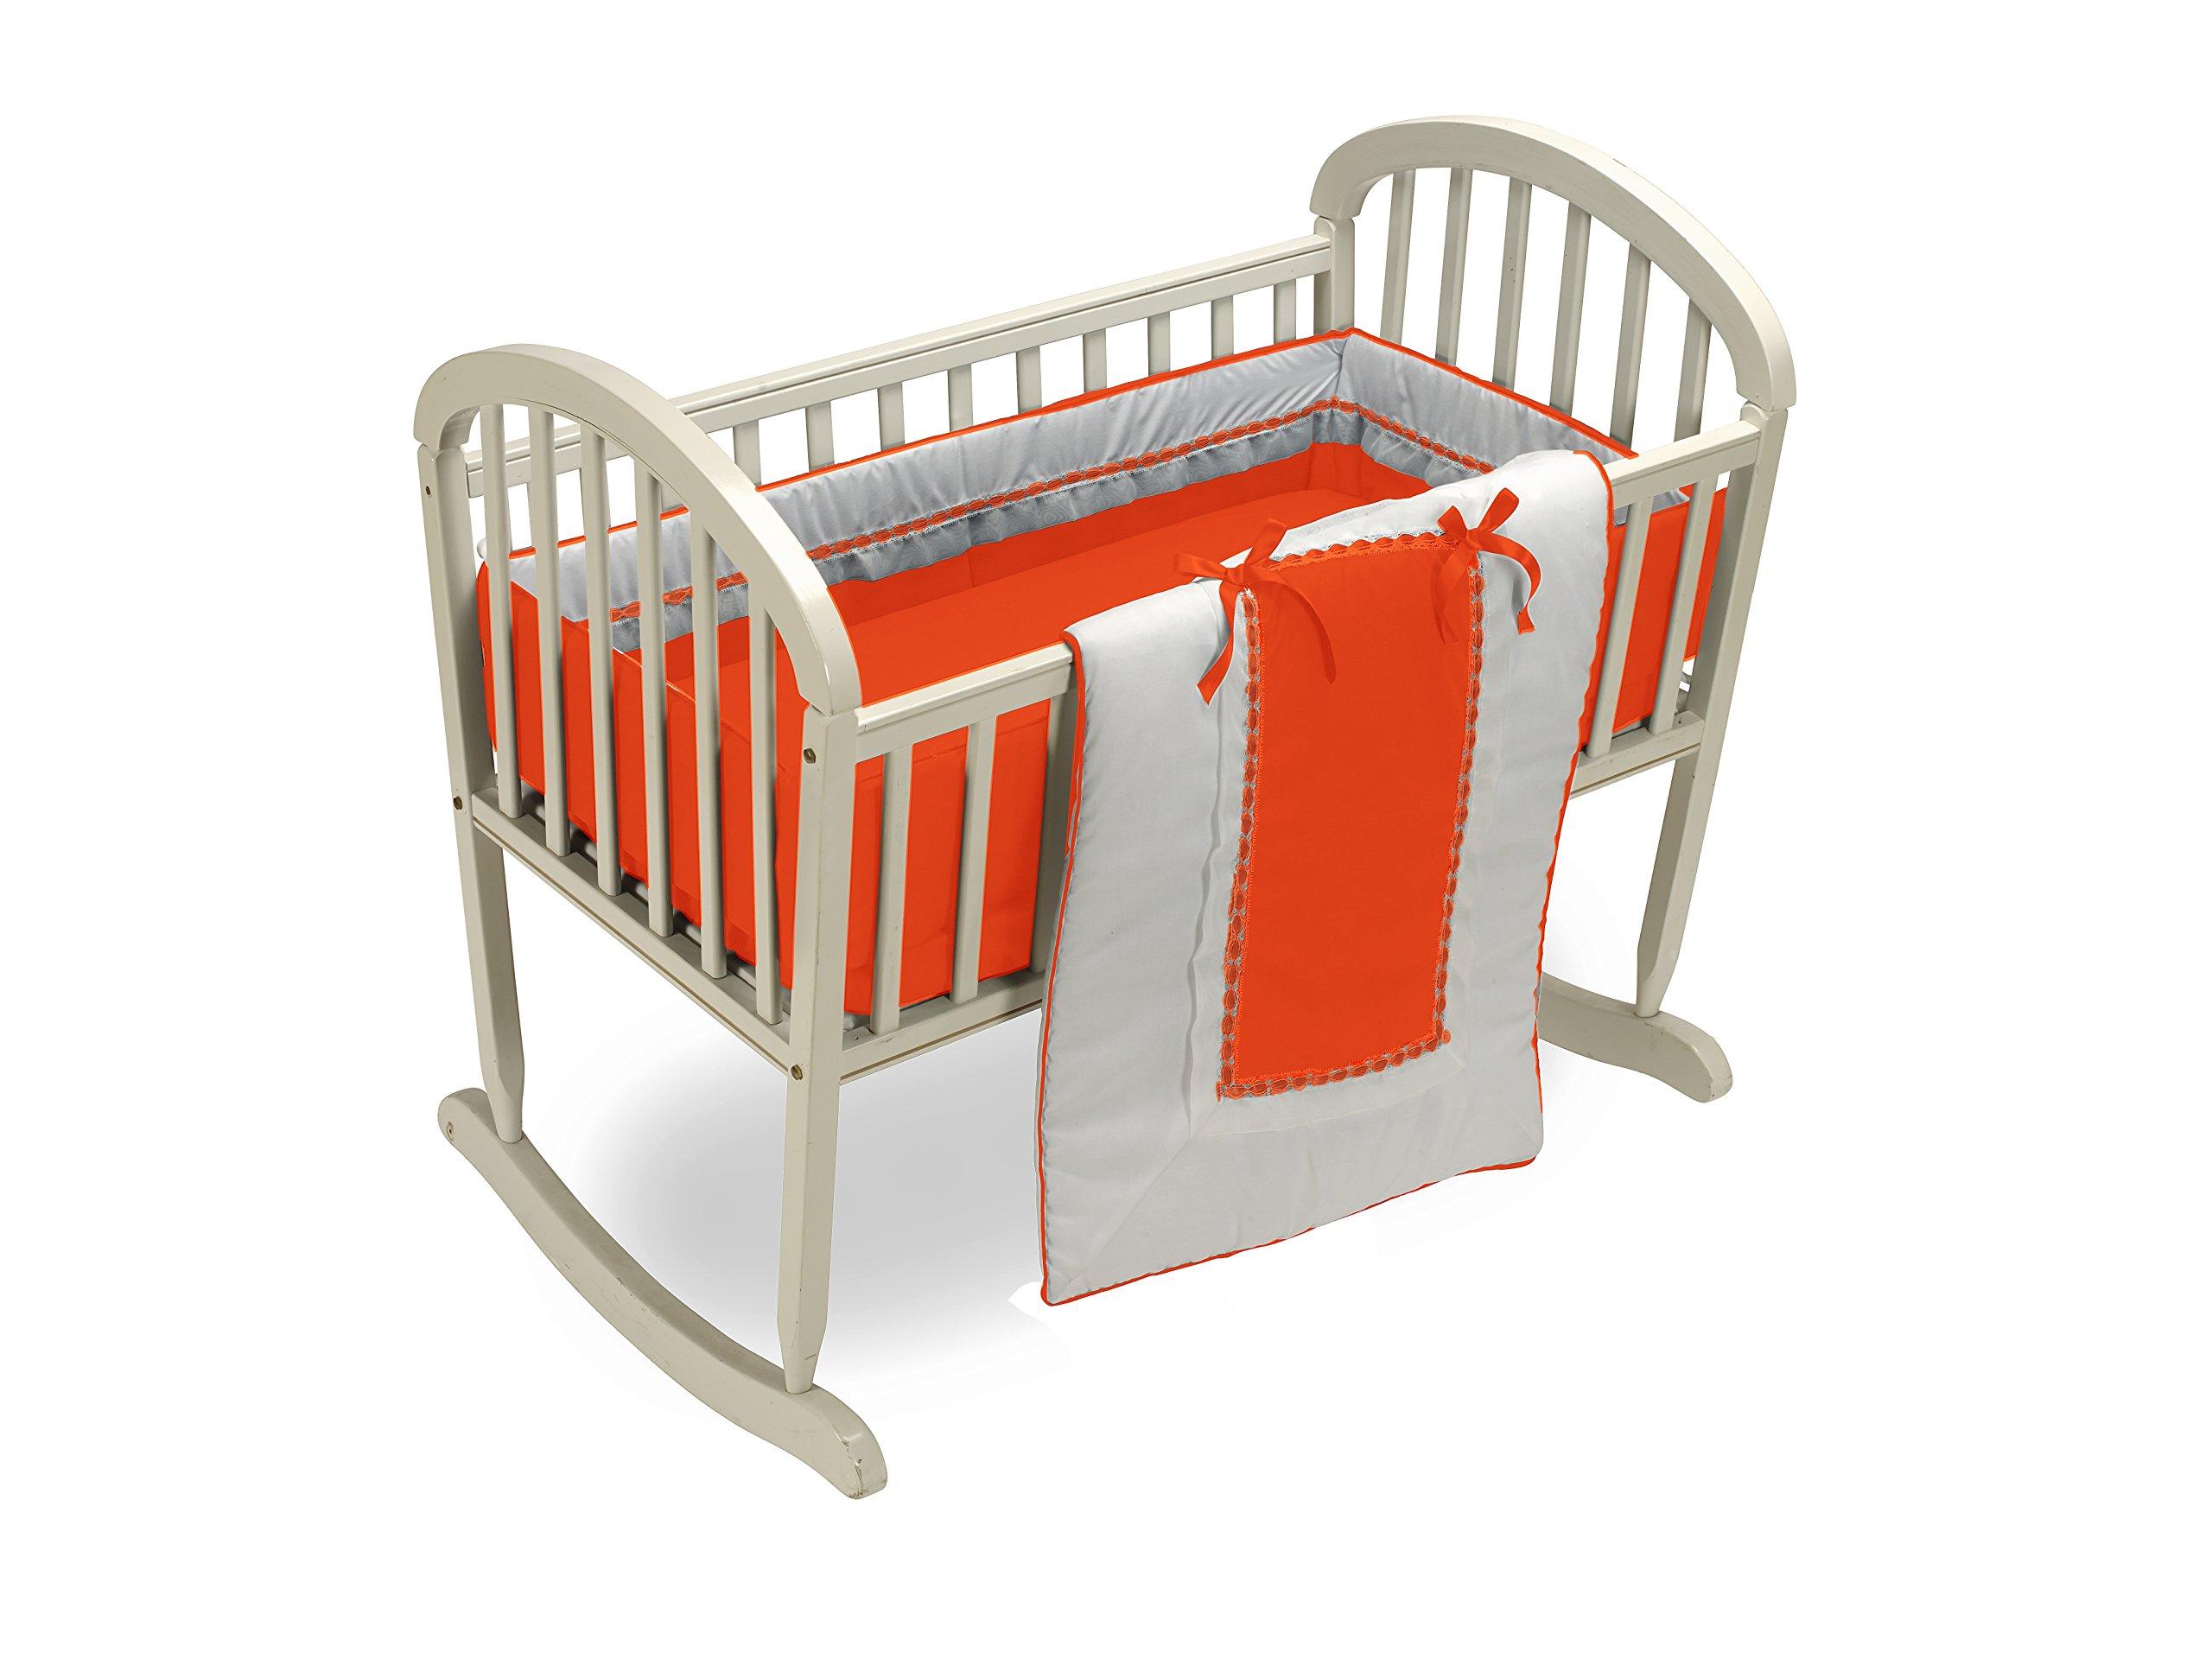 Baby Doll Bedding Royal Cradle Bedding Set, Orange